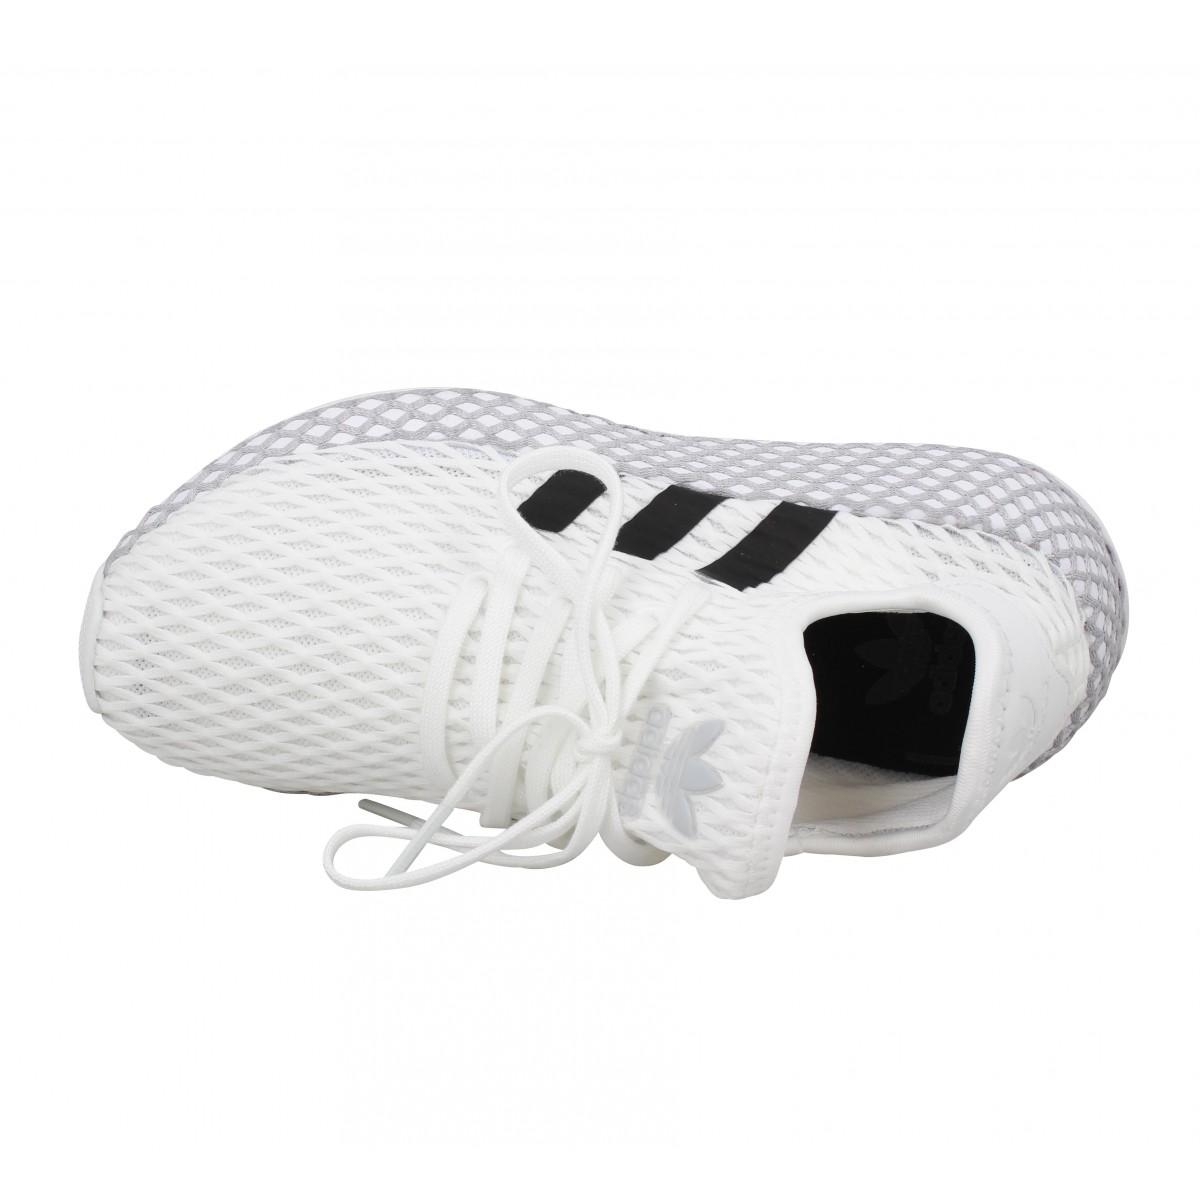 Chaussures Adidas deerupt runner toile enfant blanc enfants ...